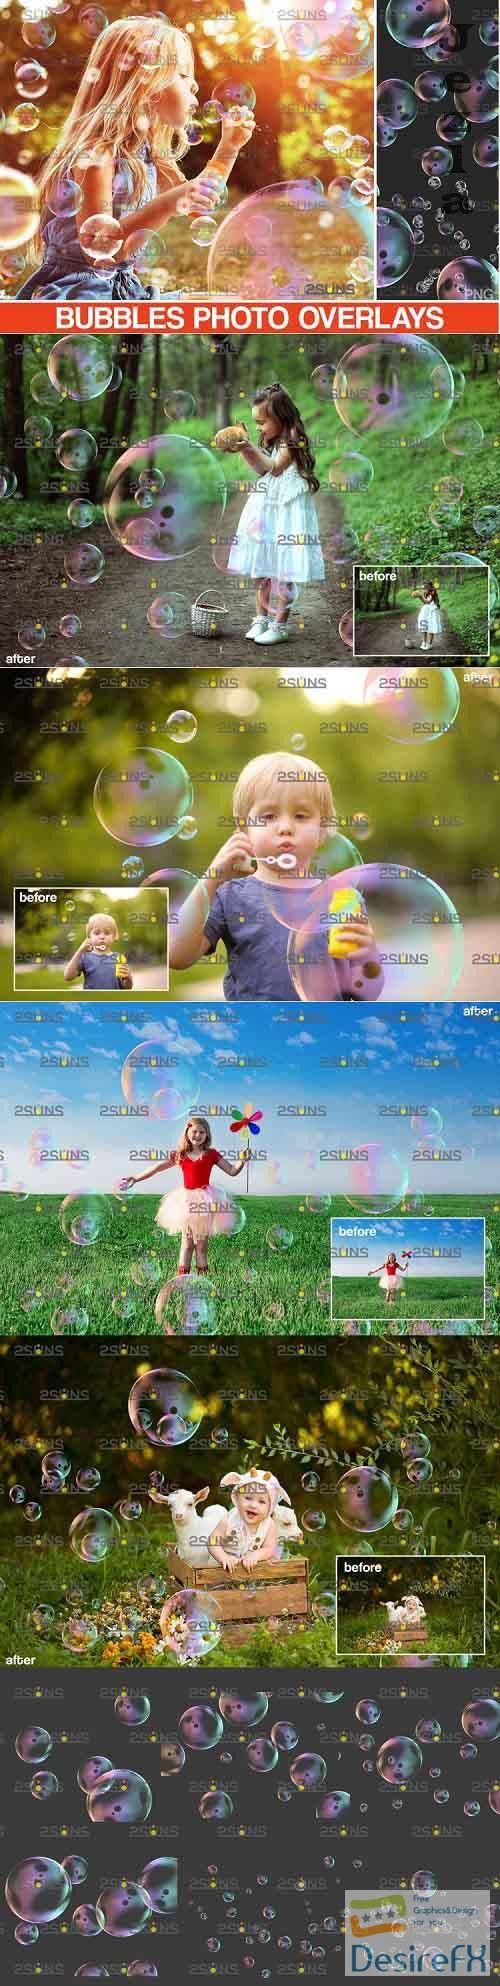 30 Photoshop overlay Bubble overlays, Soap bubbles - 895339